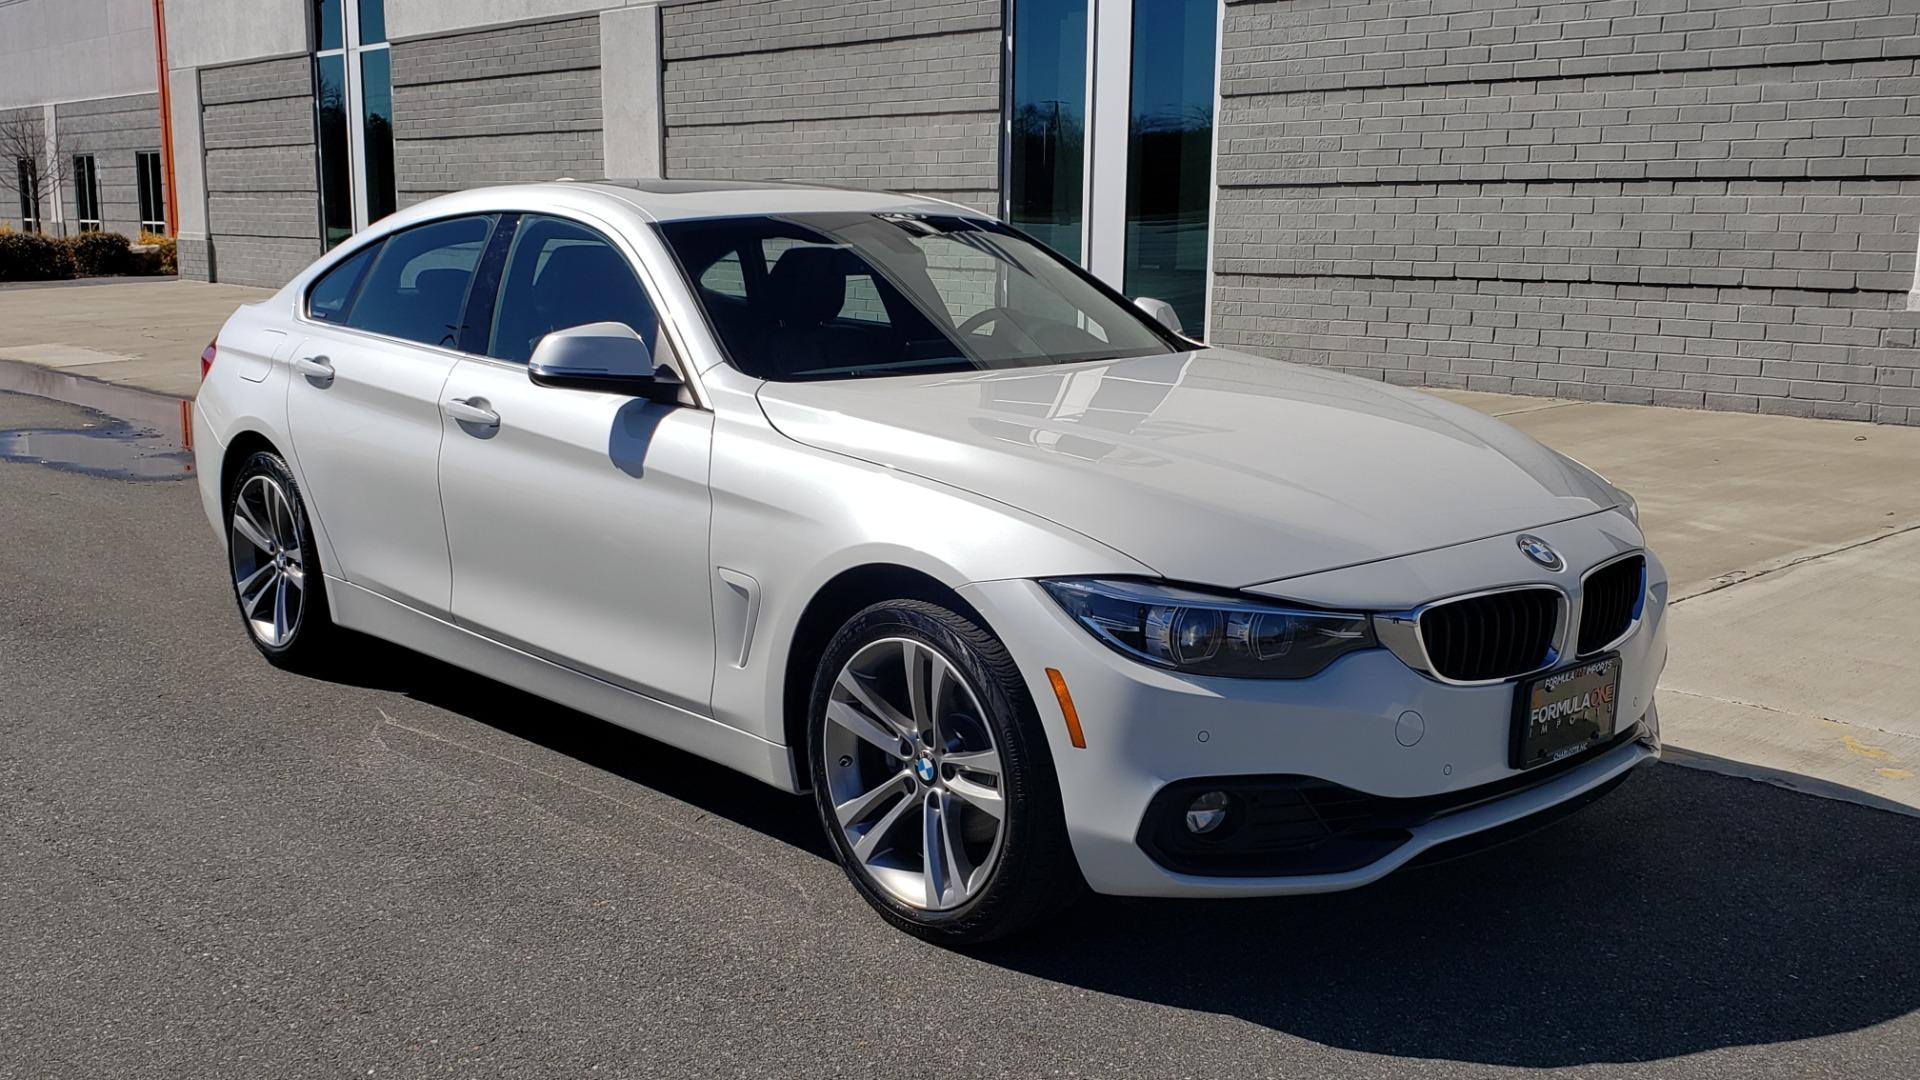 Used 2018 BMW 4 SERIES 430IXDRIVE / PREMIUM / NAV / SUNROOF / ESSENTIALS PKG for sale $27,795 at Formula Imports in Charlotte NC 28227 5